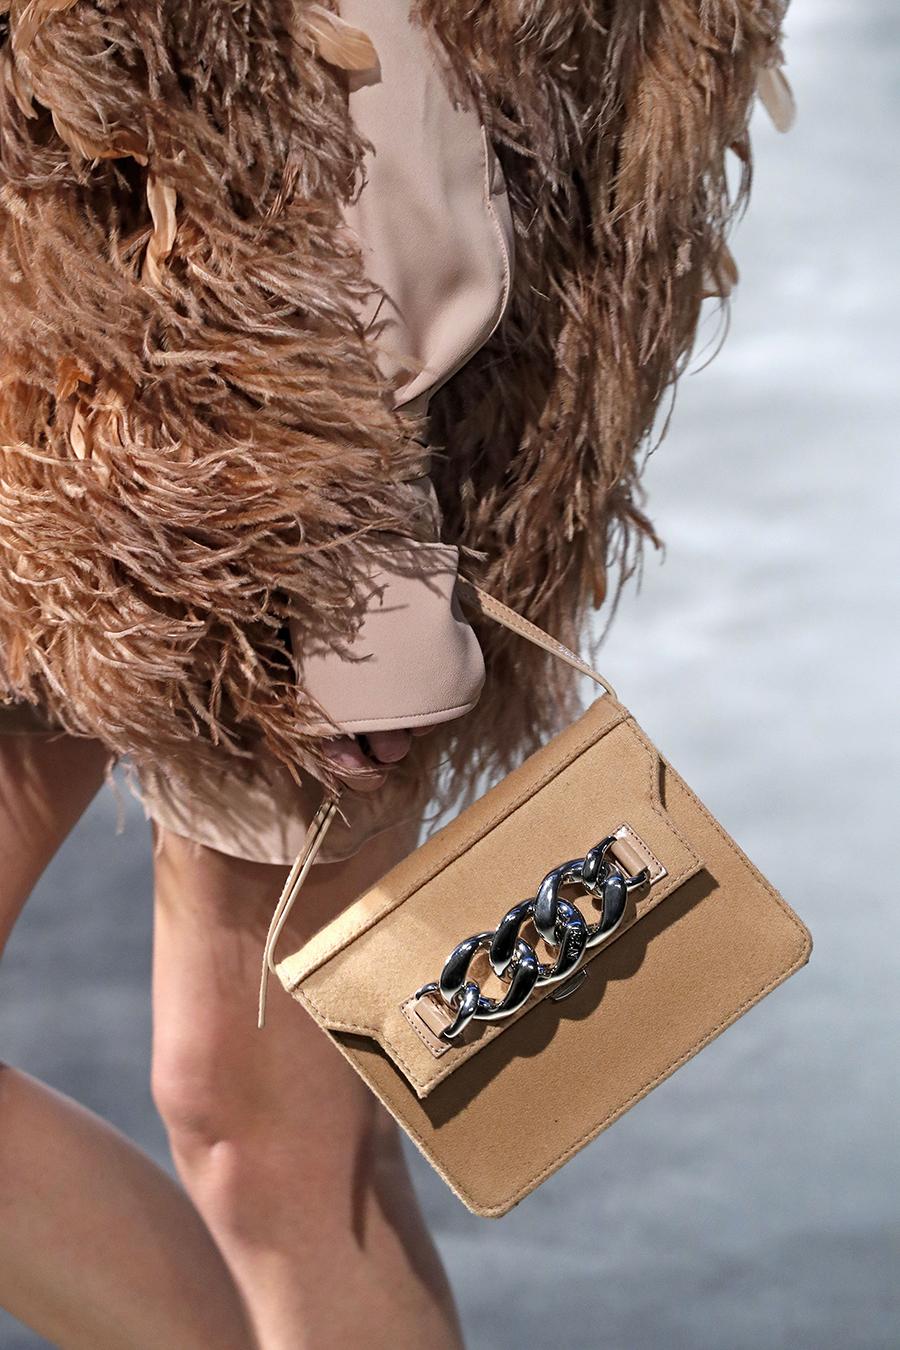 модная сумка на цепочке осень зима 2020 2021 бежевая замшевая